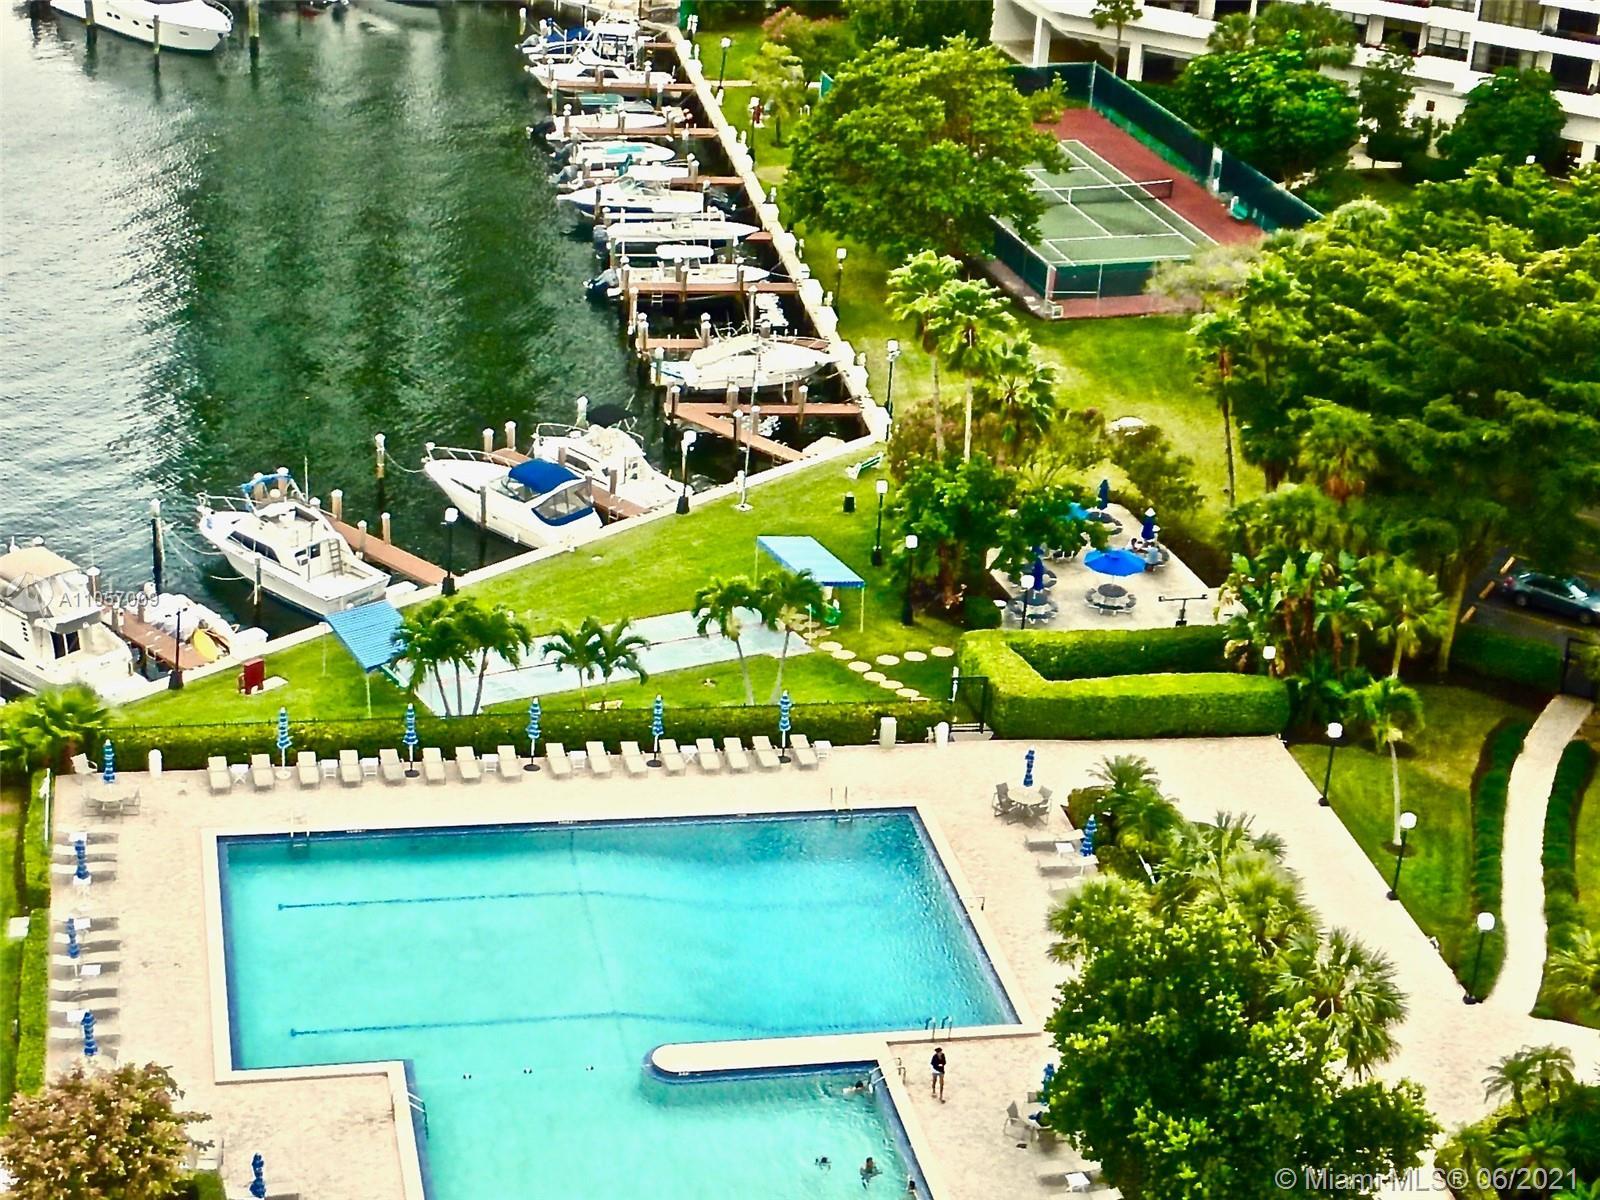 Olympus C #2020 - 2500 PARKVIEW DR #2020, Hallandale Beach, FL 33009